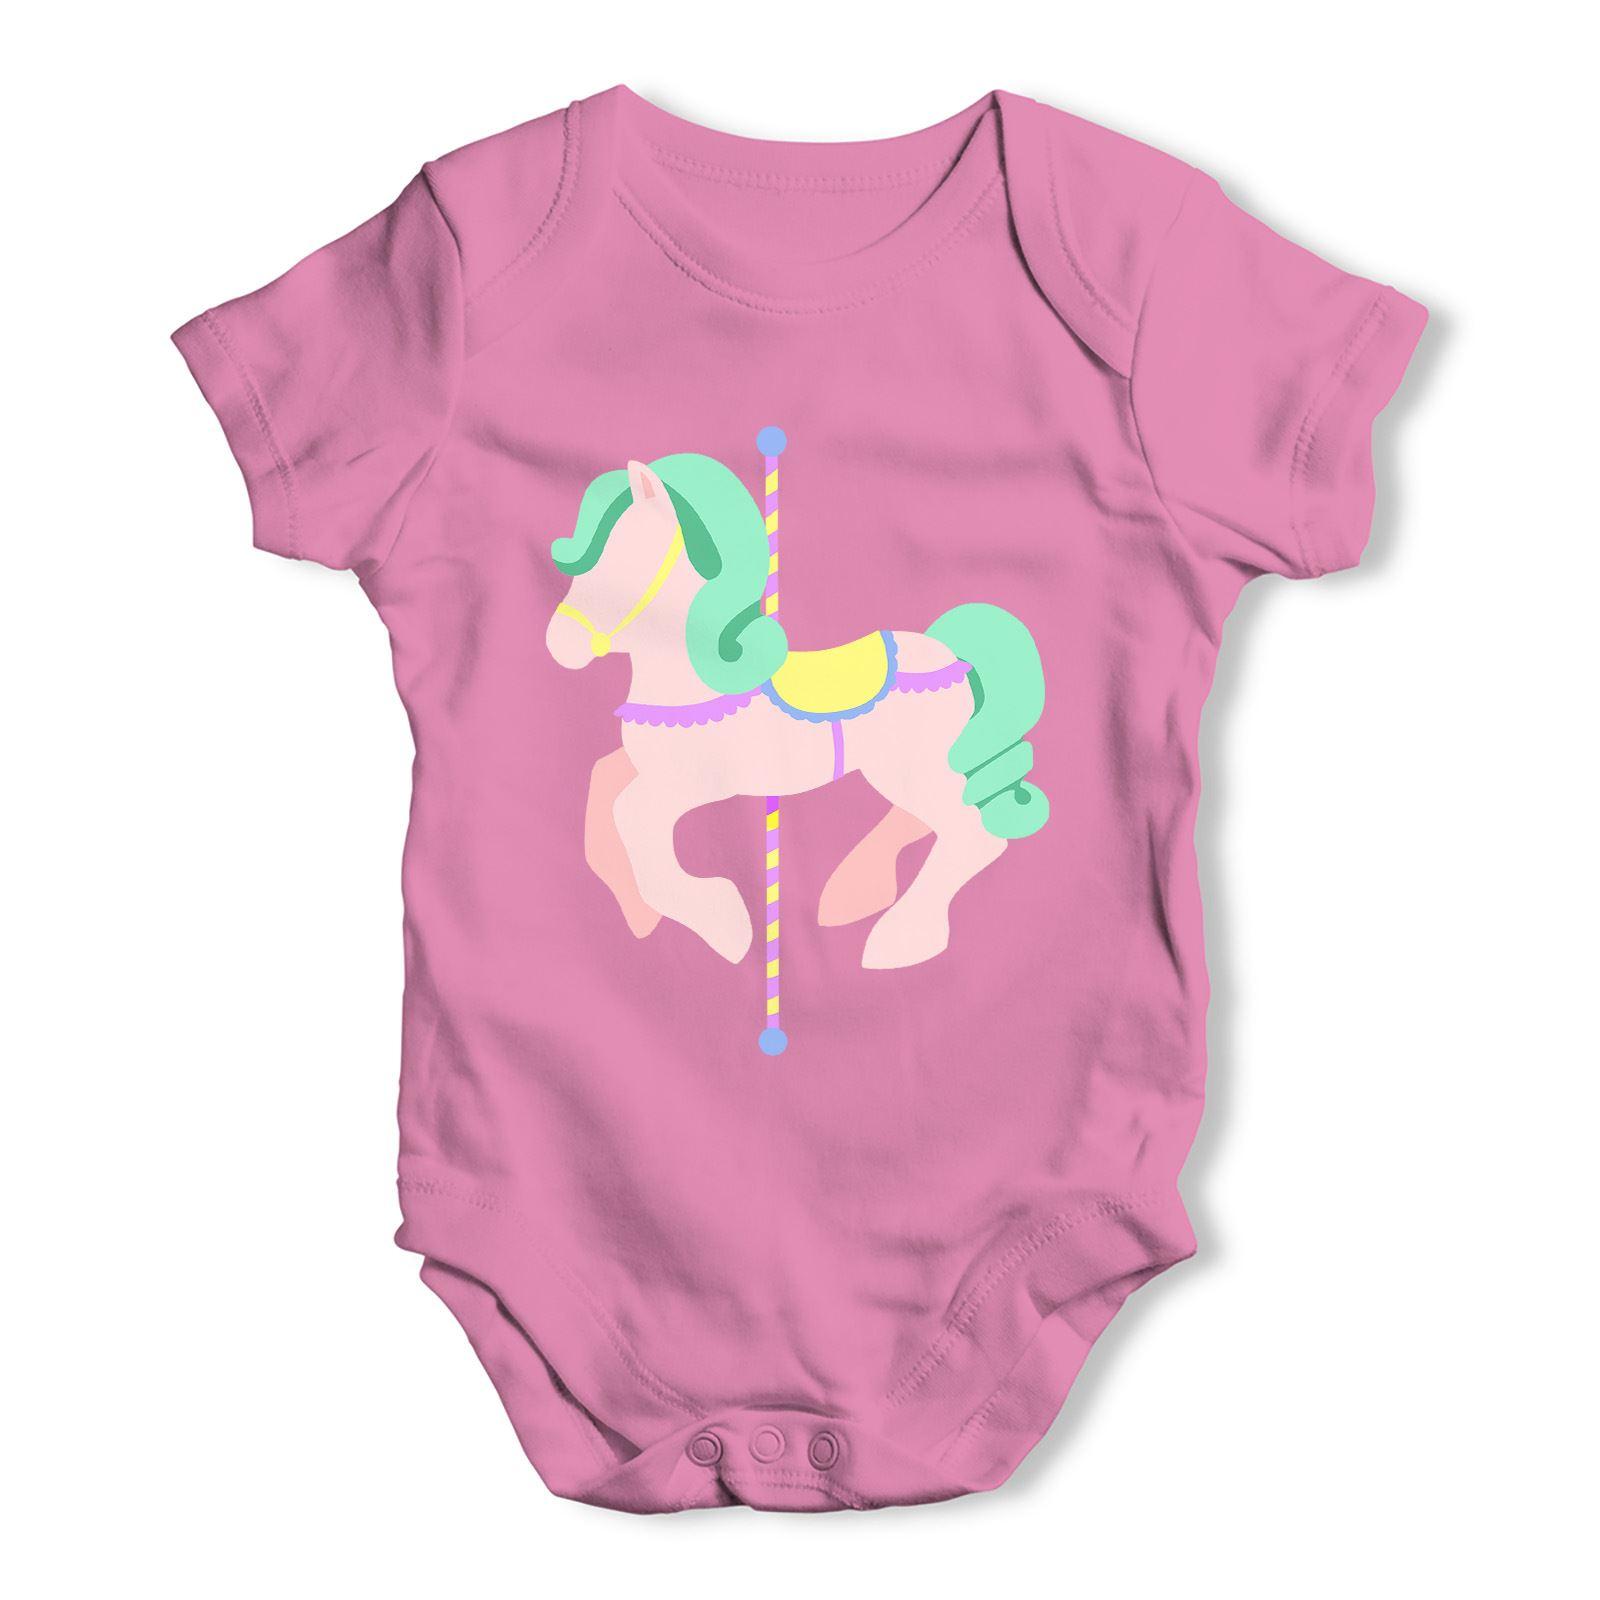 Twisted Envy Geometric Rainbow Horses Baby Unisex Funny Baby Grow Bodysuit